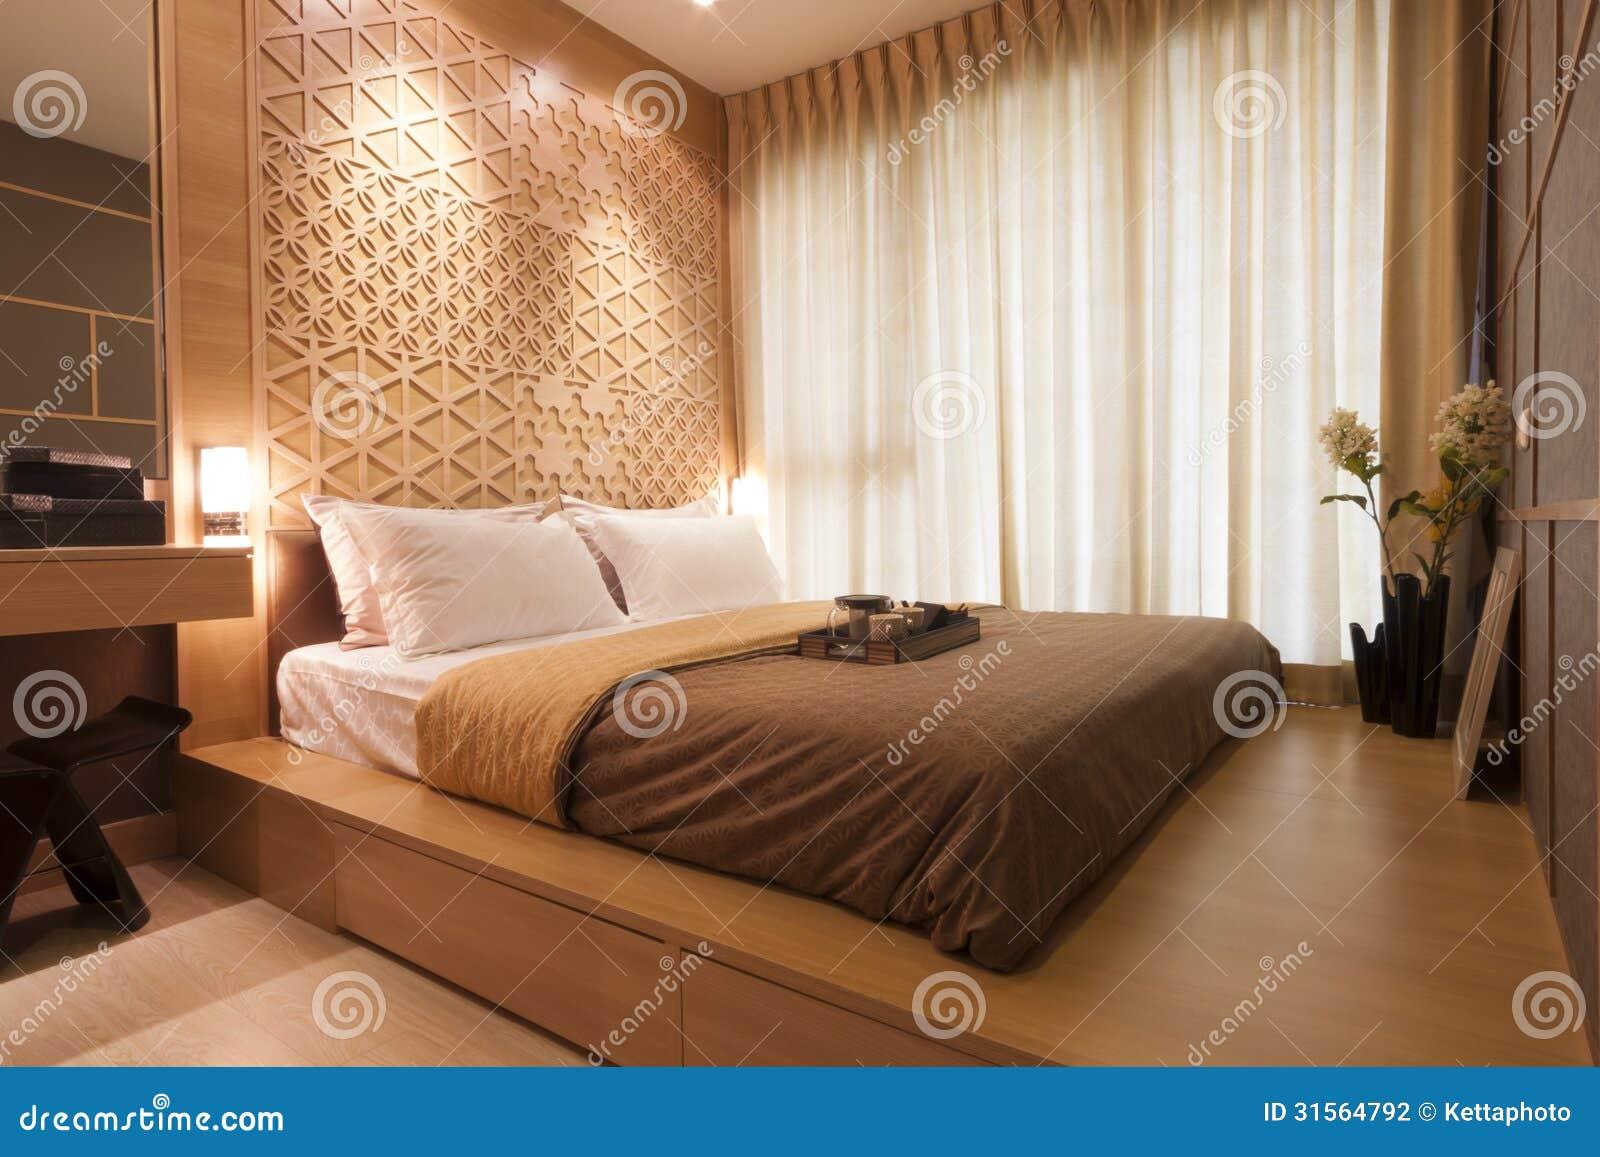 fascinating japanese style bedroom furniture | Japanese style stock photo. Image of furnishing, japanese ...